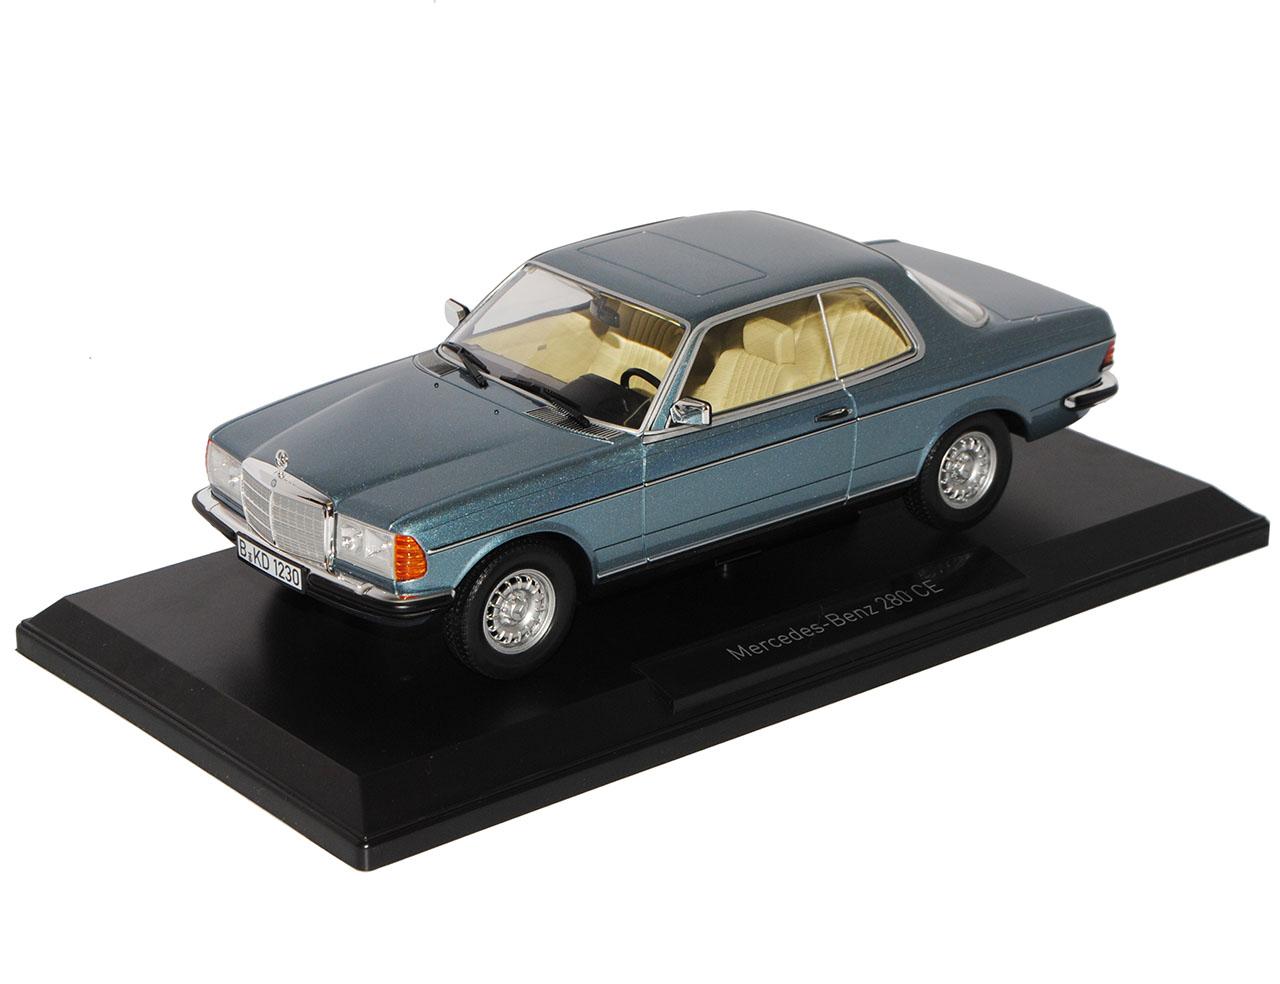 Mercedes-Benz E-Klasse Coupe 280 CE C123 Blau Silber 1975-1986 1//18 Norev Mode..